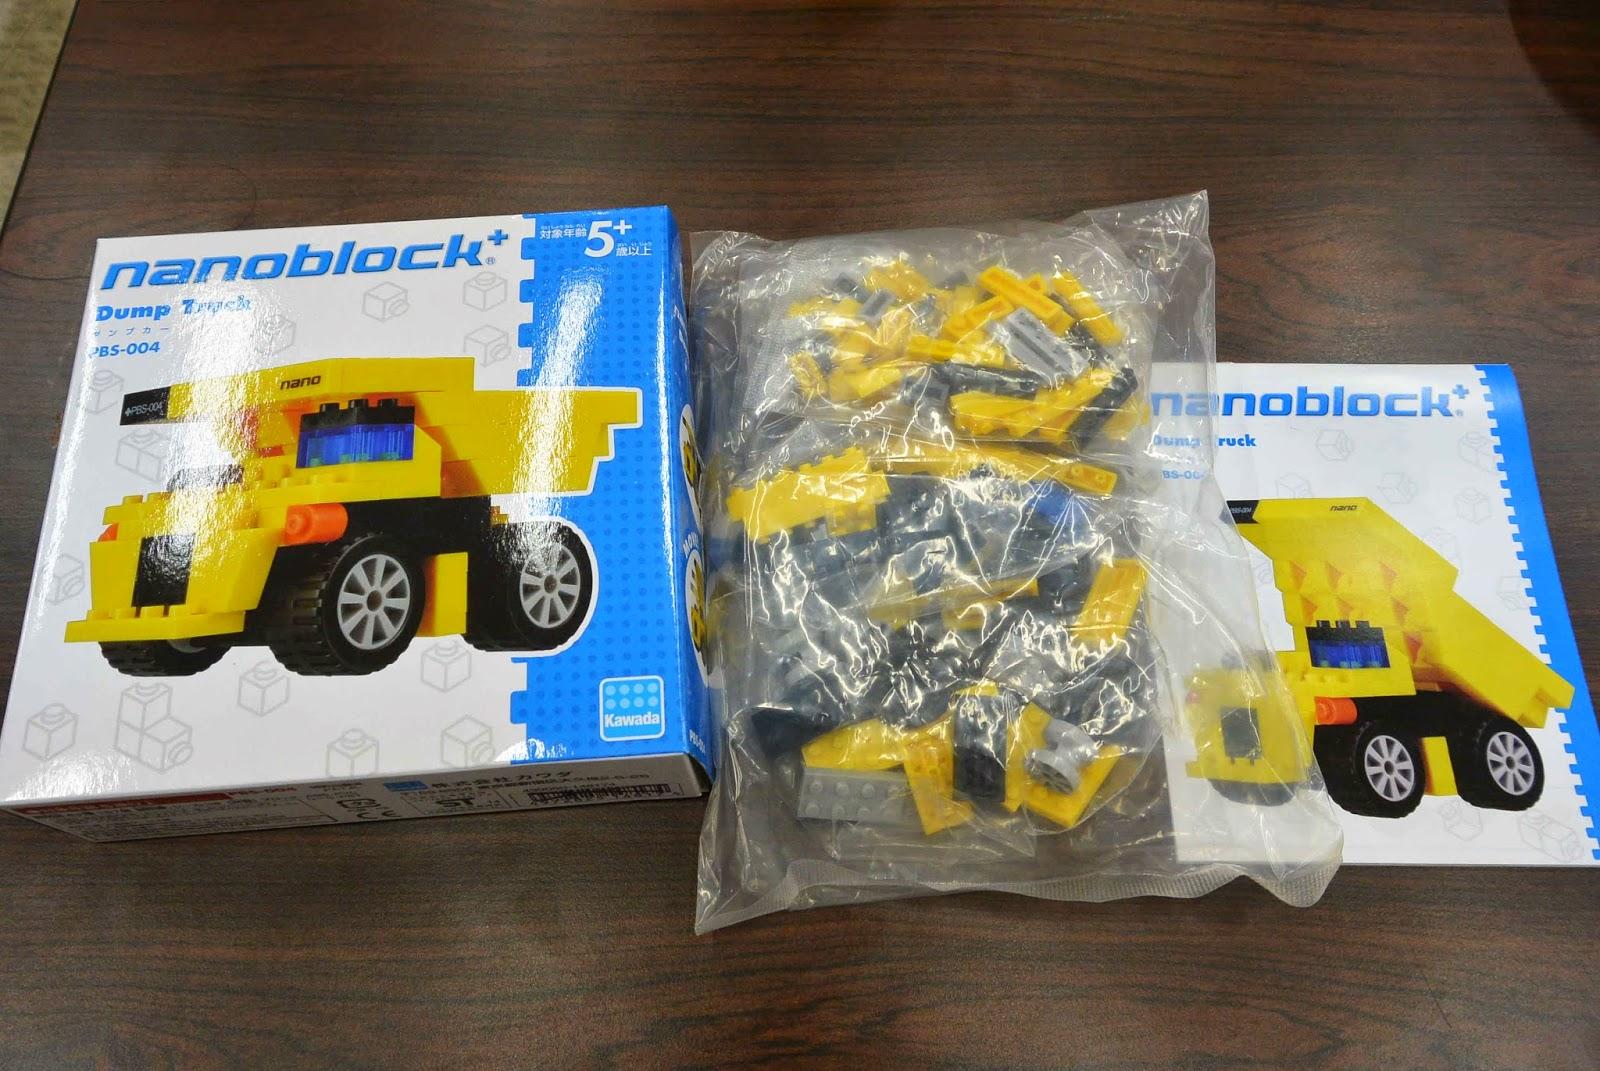 nanoblock+(ナノブロック+)